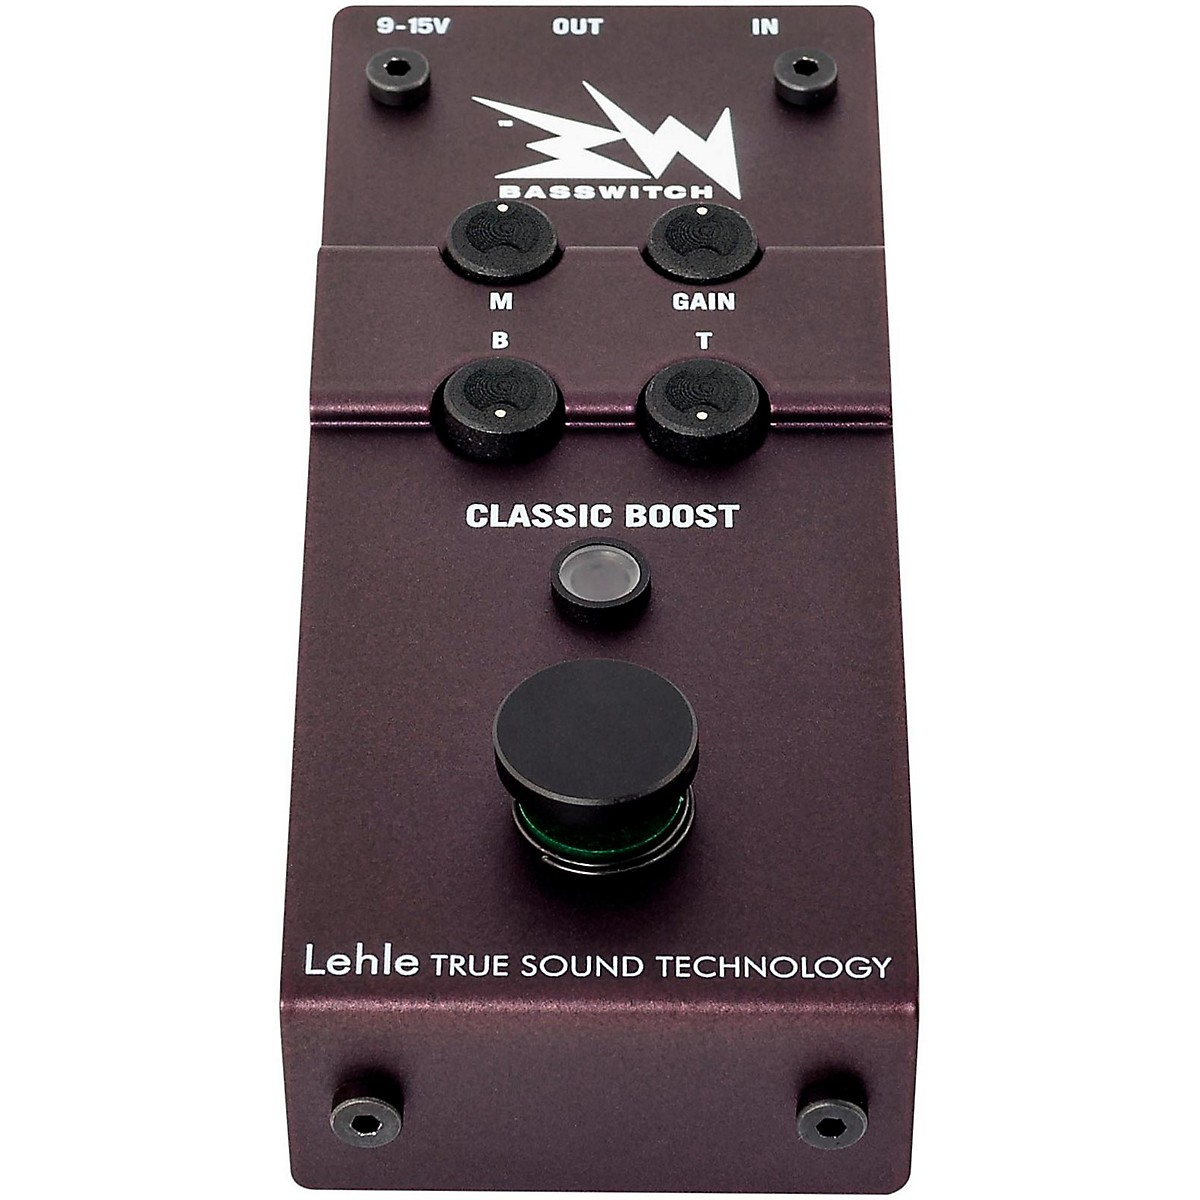 Lehle RMI Basswitch Classic Boost-Pro Equipment Pedal